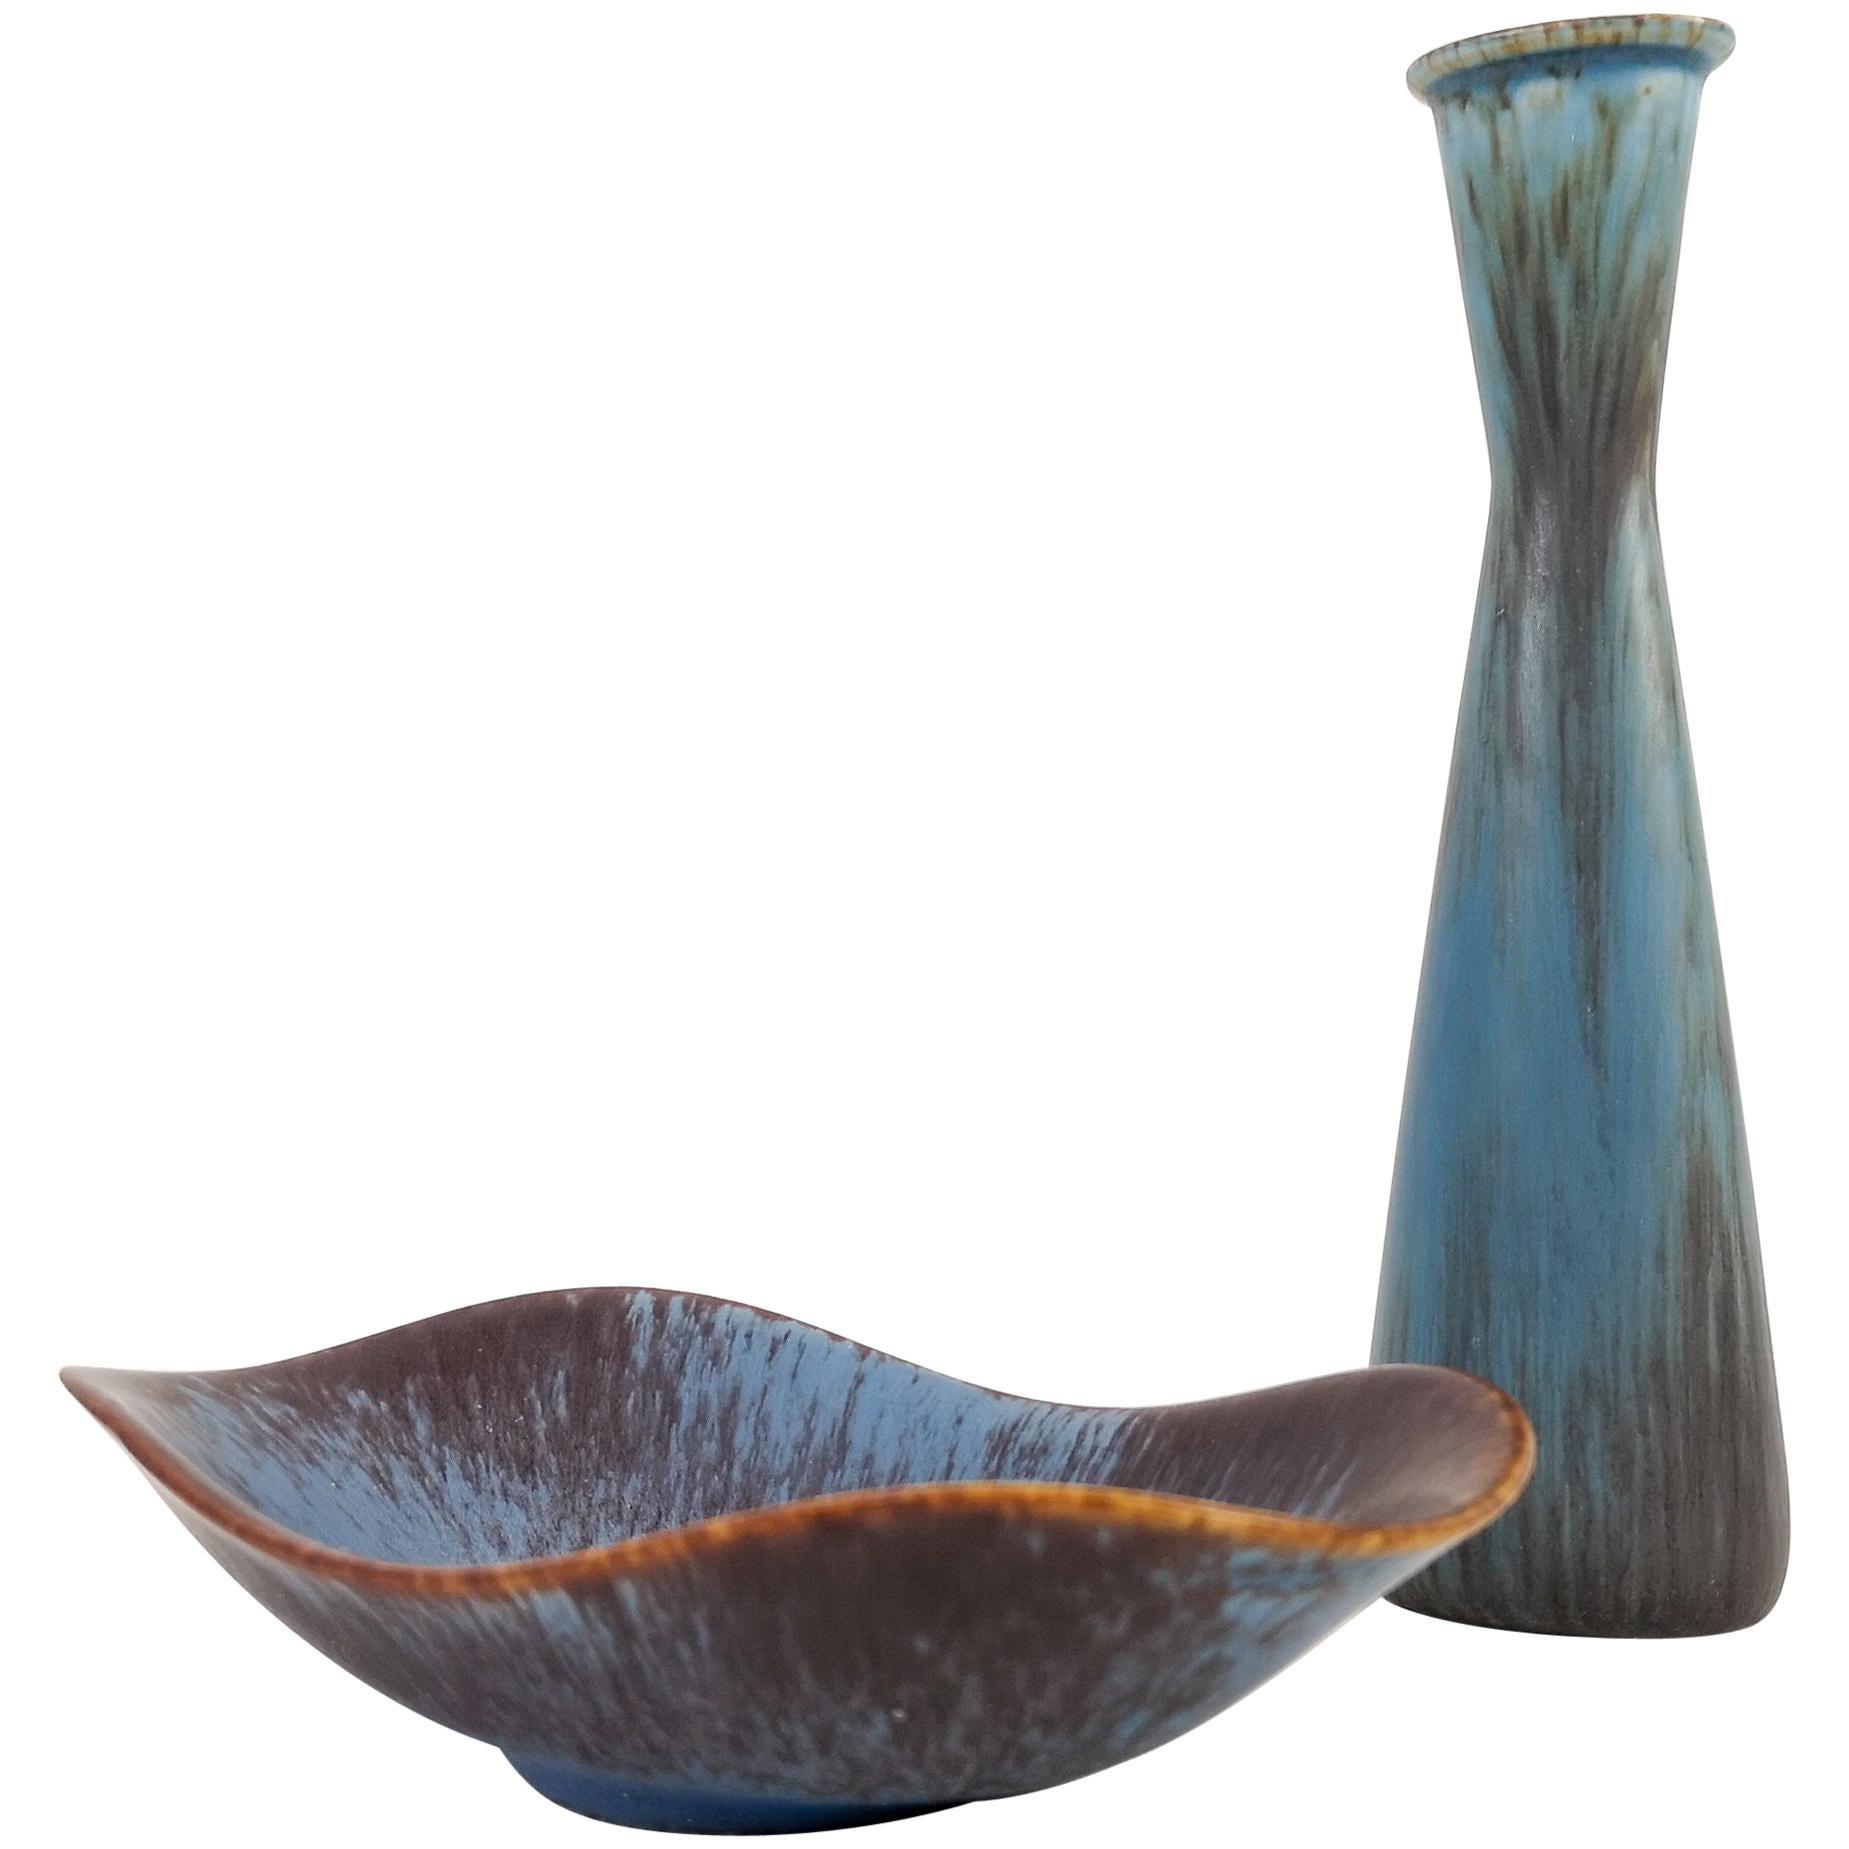 Midcentury Ceramic Set of 2 Pieces Gunnar Nylund Rörstrand Sweden